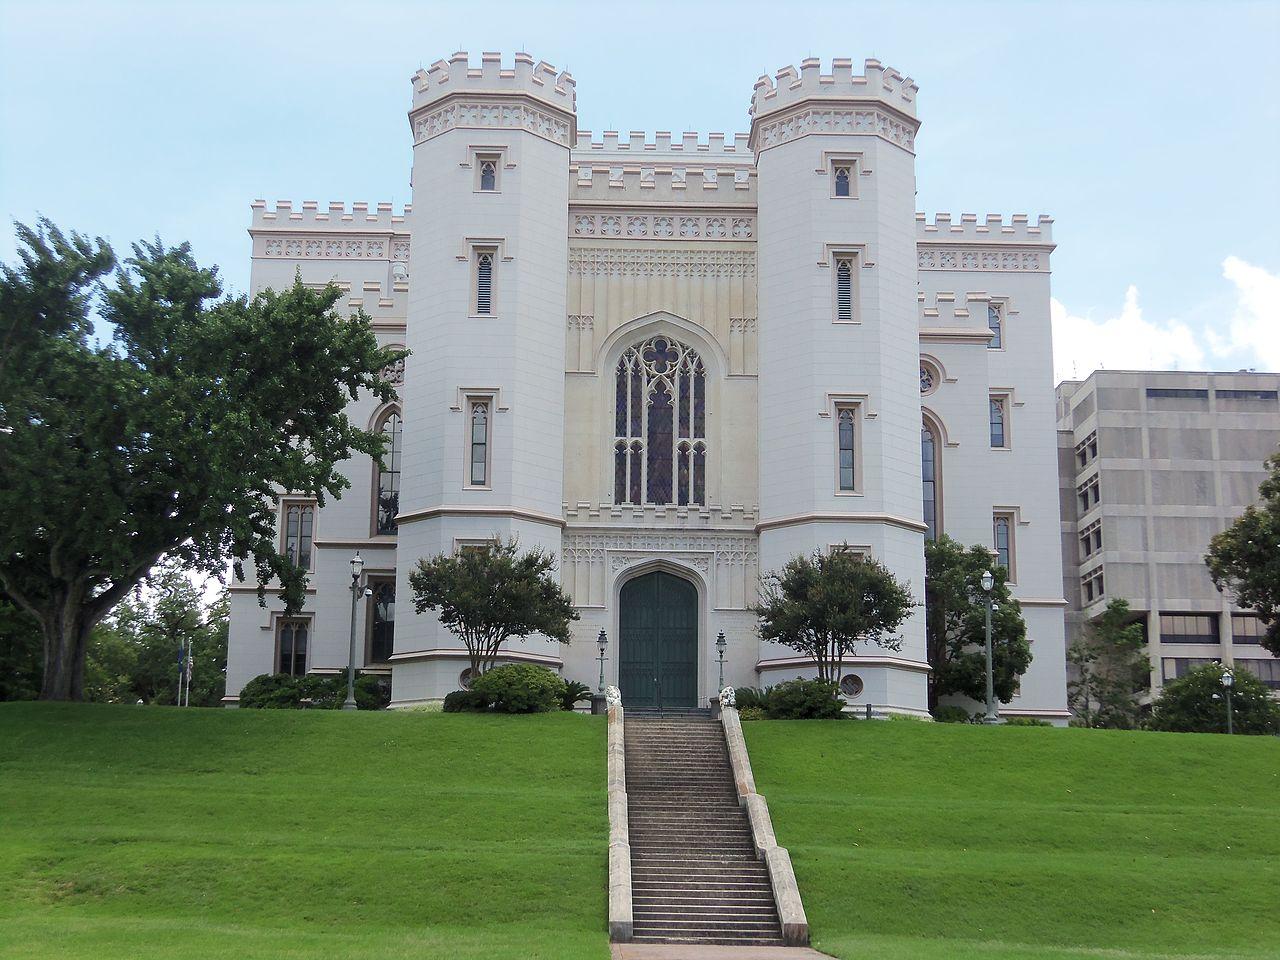 Louisiana's Old State Capitol, Baton Rouge, LA